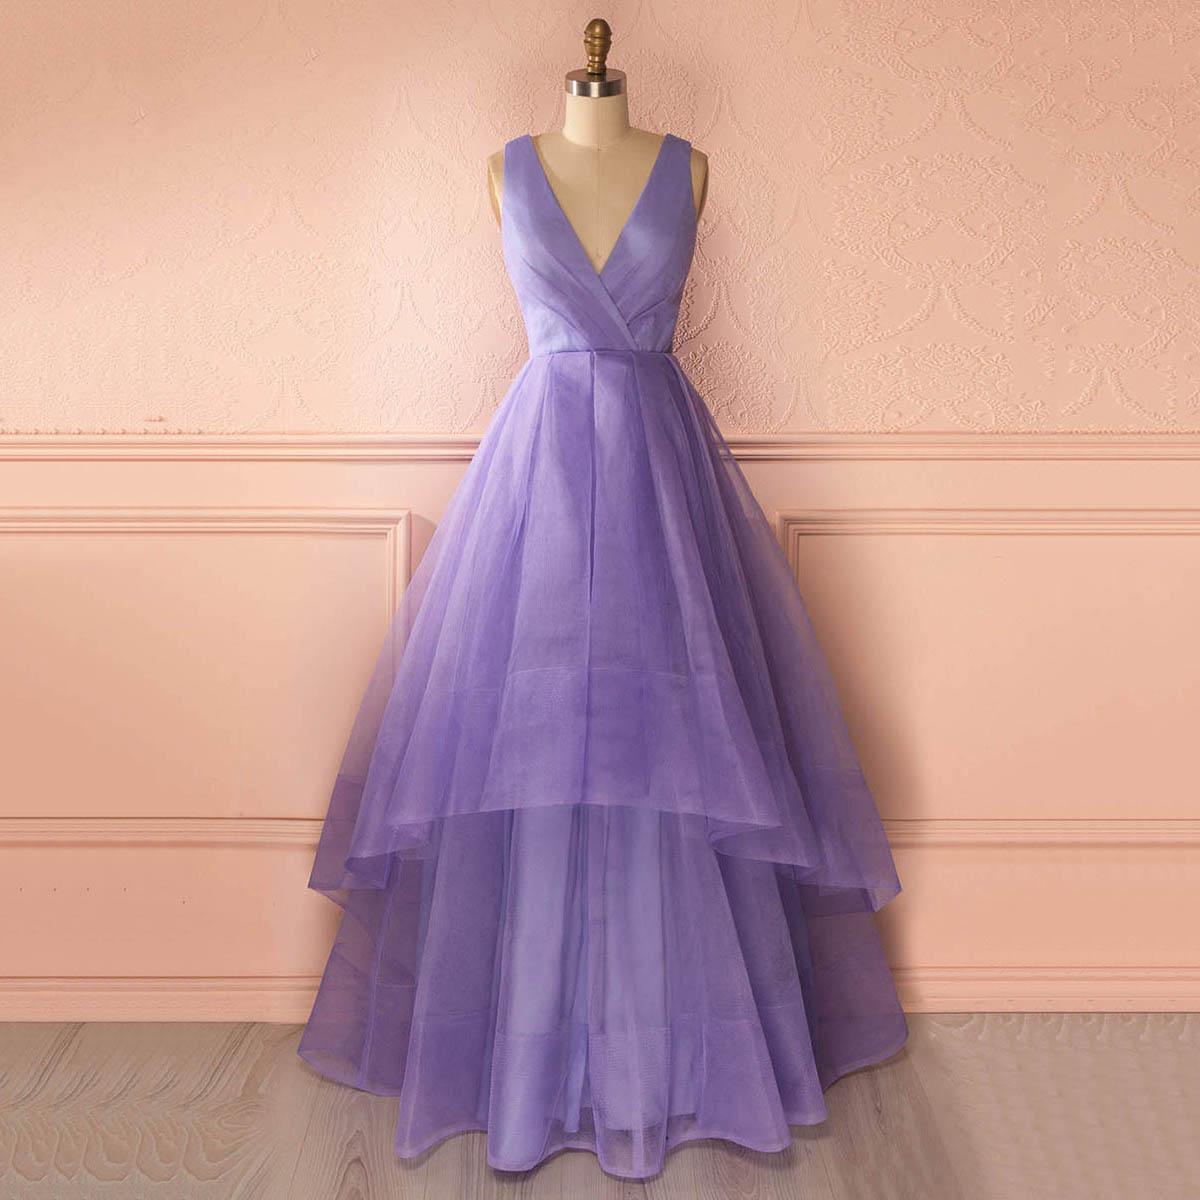 7cecf59703f Unique Deep V Neck Floor Length Prom Dress